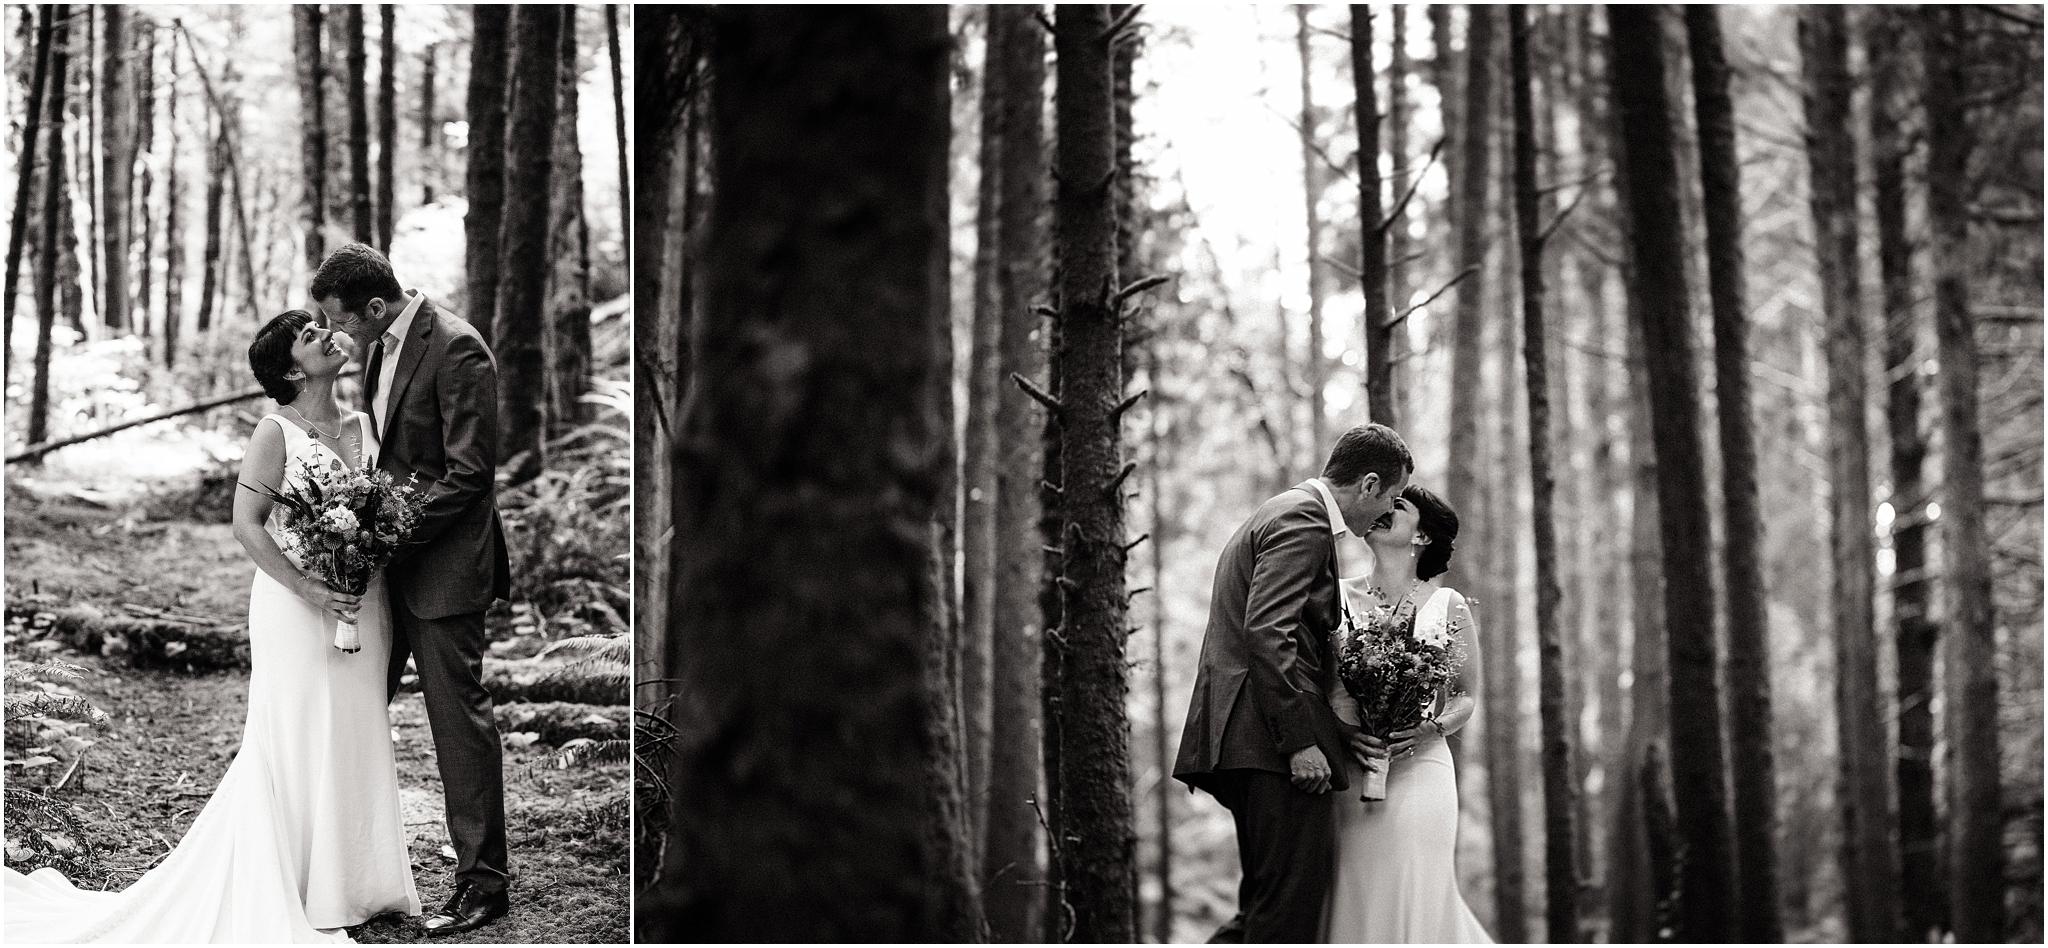 Oregon Coast Intimate Wedding | oregon elopement photographer | oregon elopement12.jpg